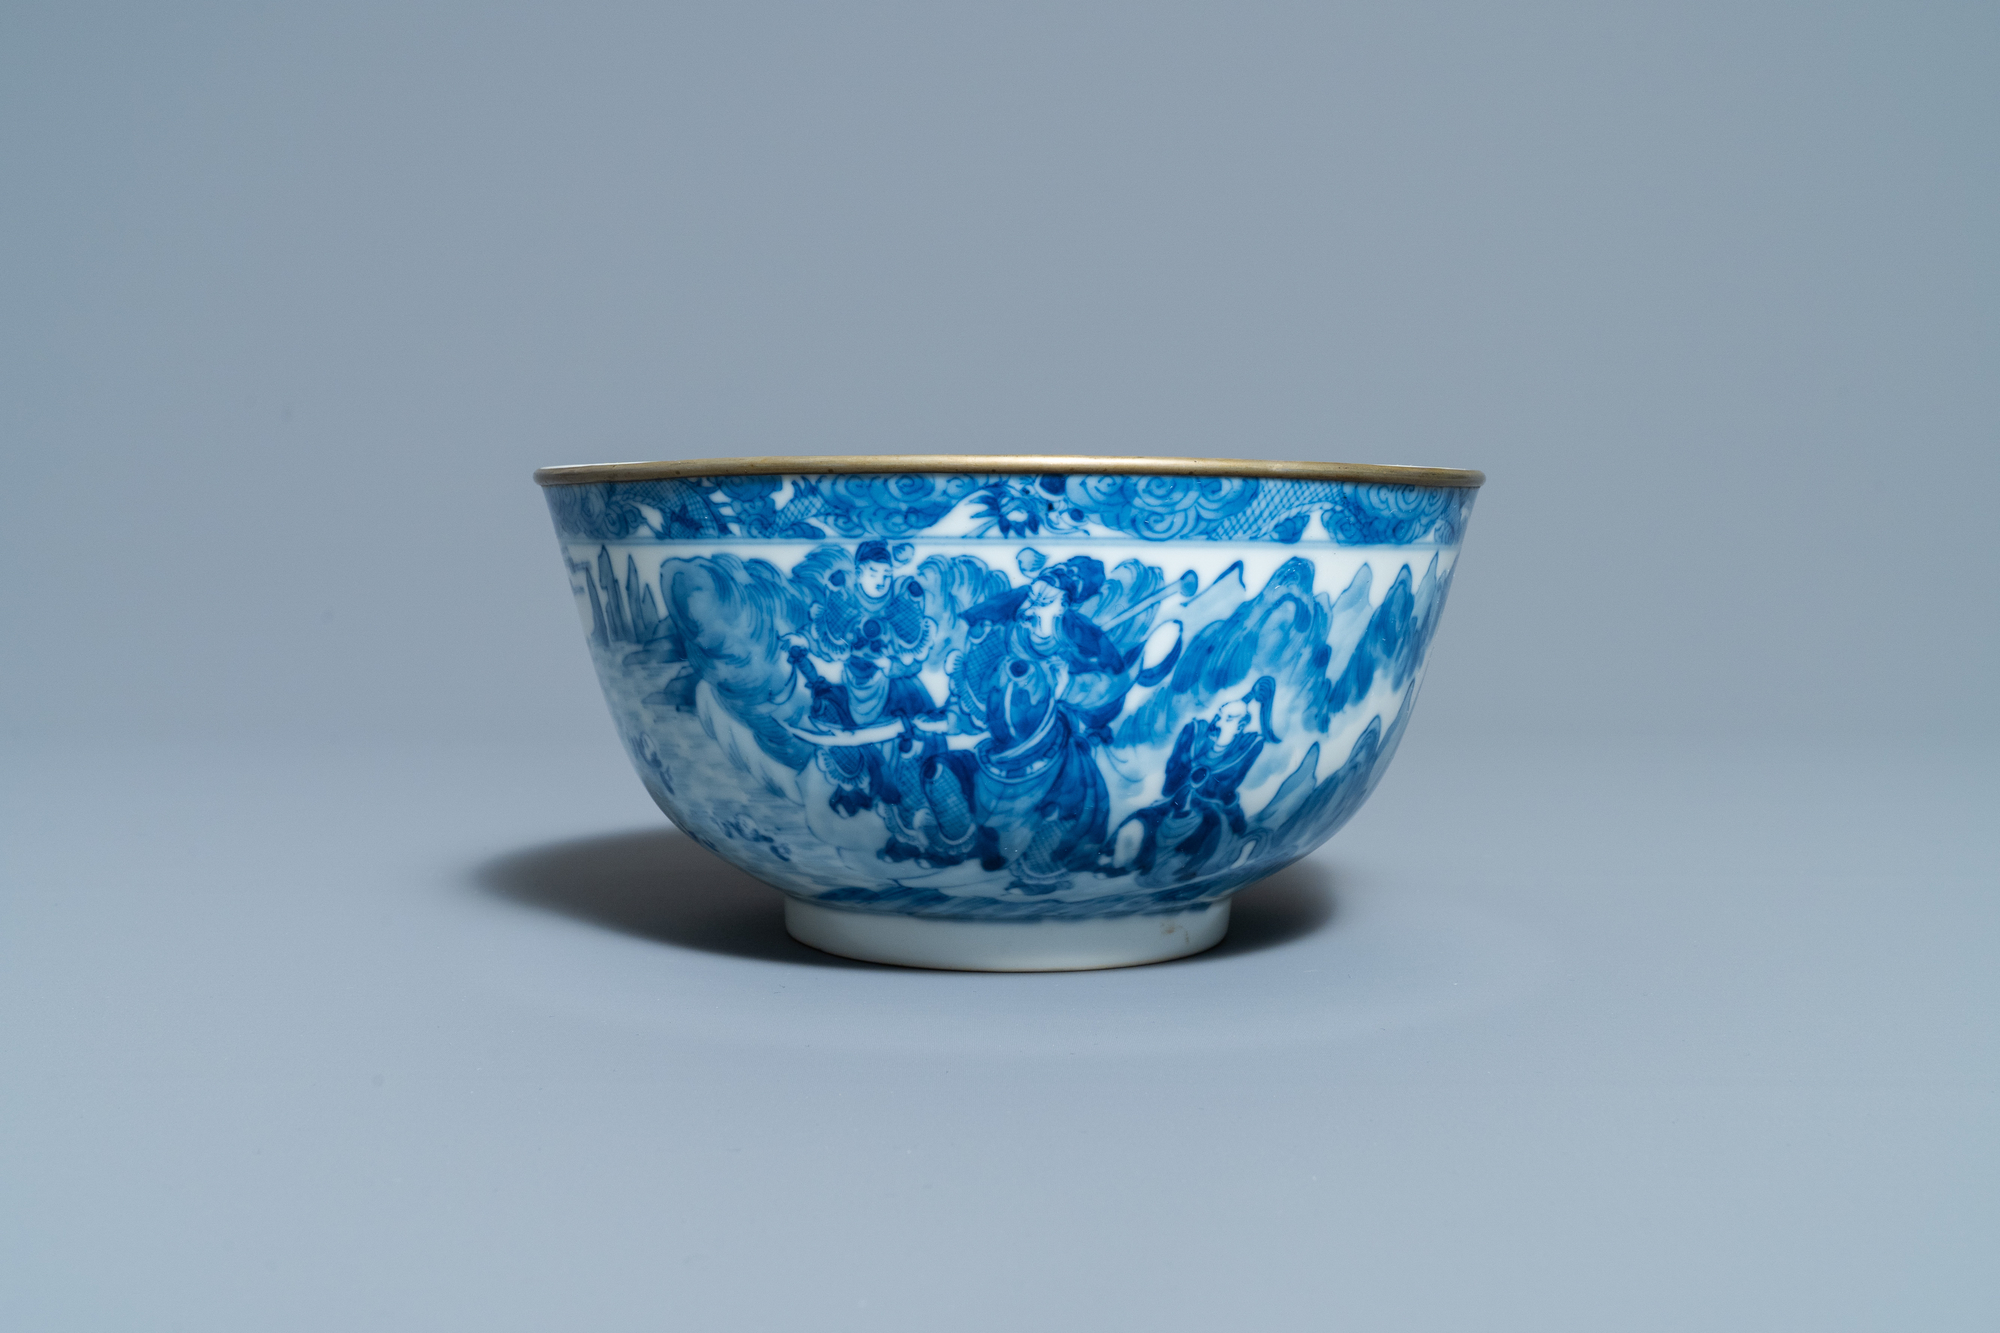 A Chinese blue and white Vietnamese market 'Bleu de Hue' bowl, Kangxi mark, 19th C. - Image 2 of 7